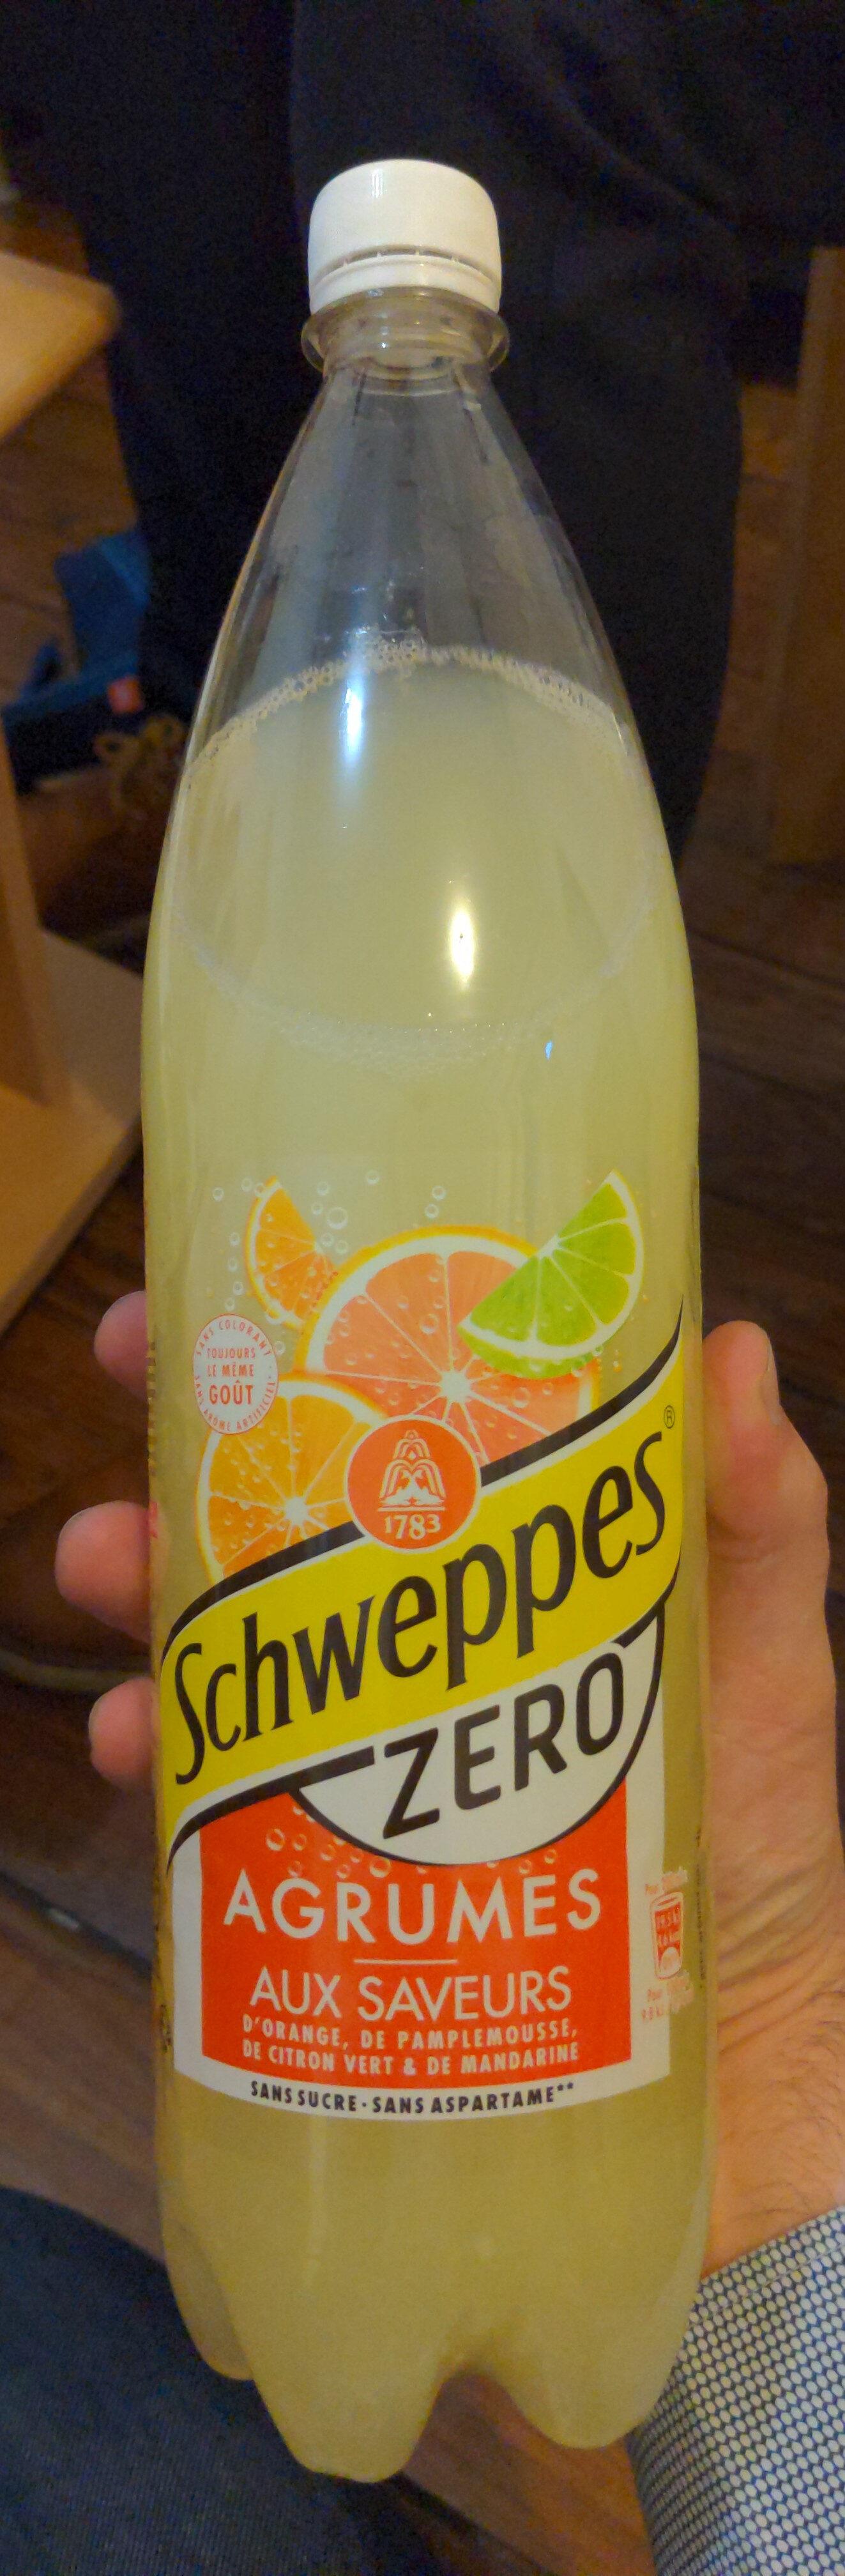 Schweppes Zero Agrum' - Produit - fr